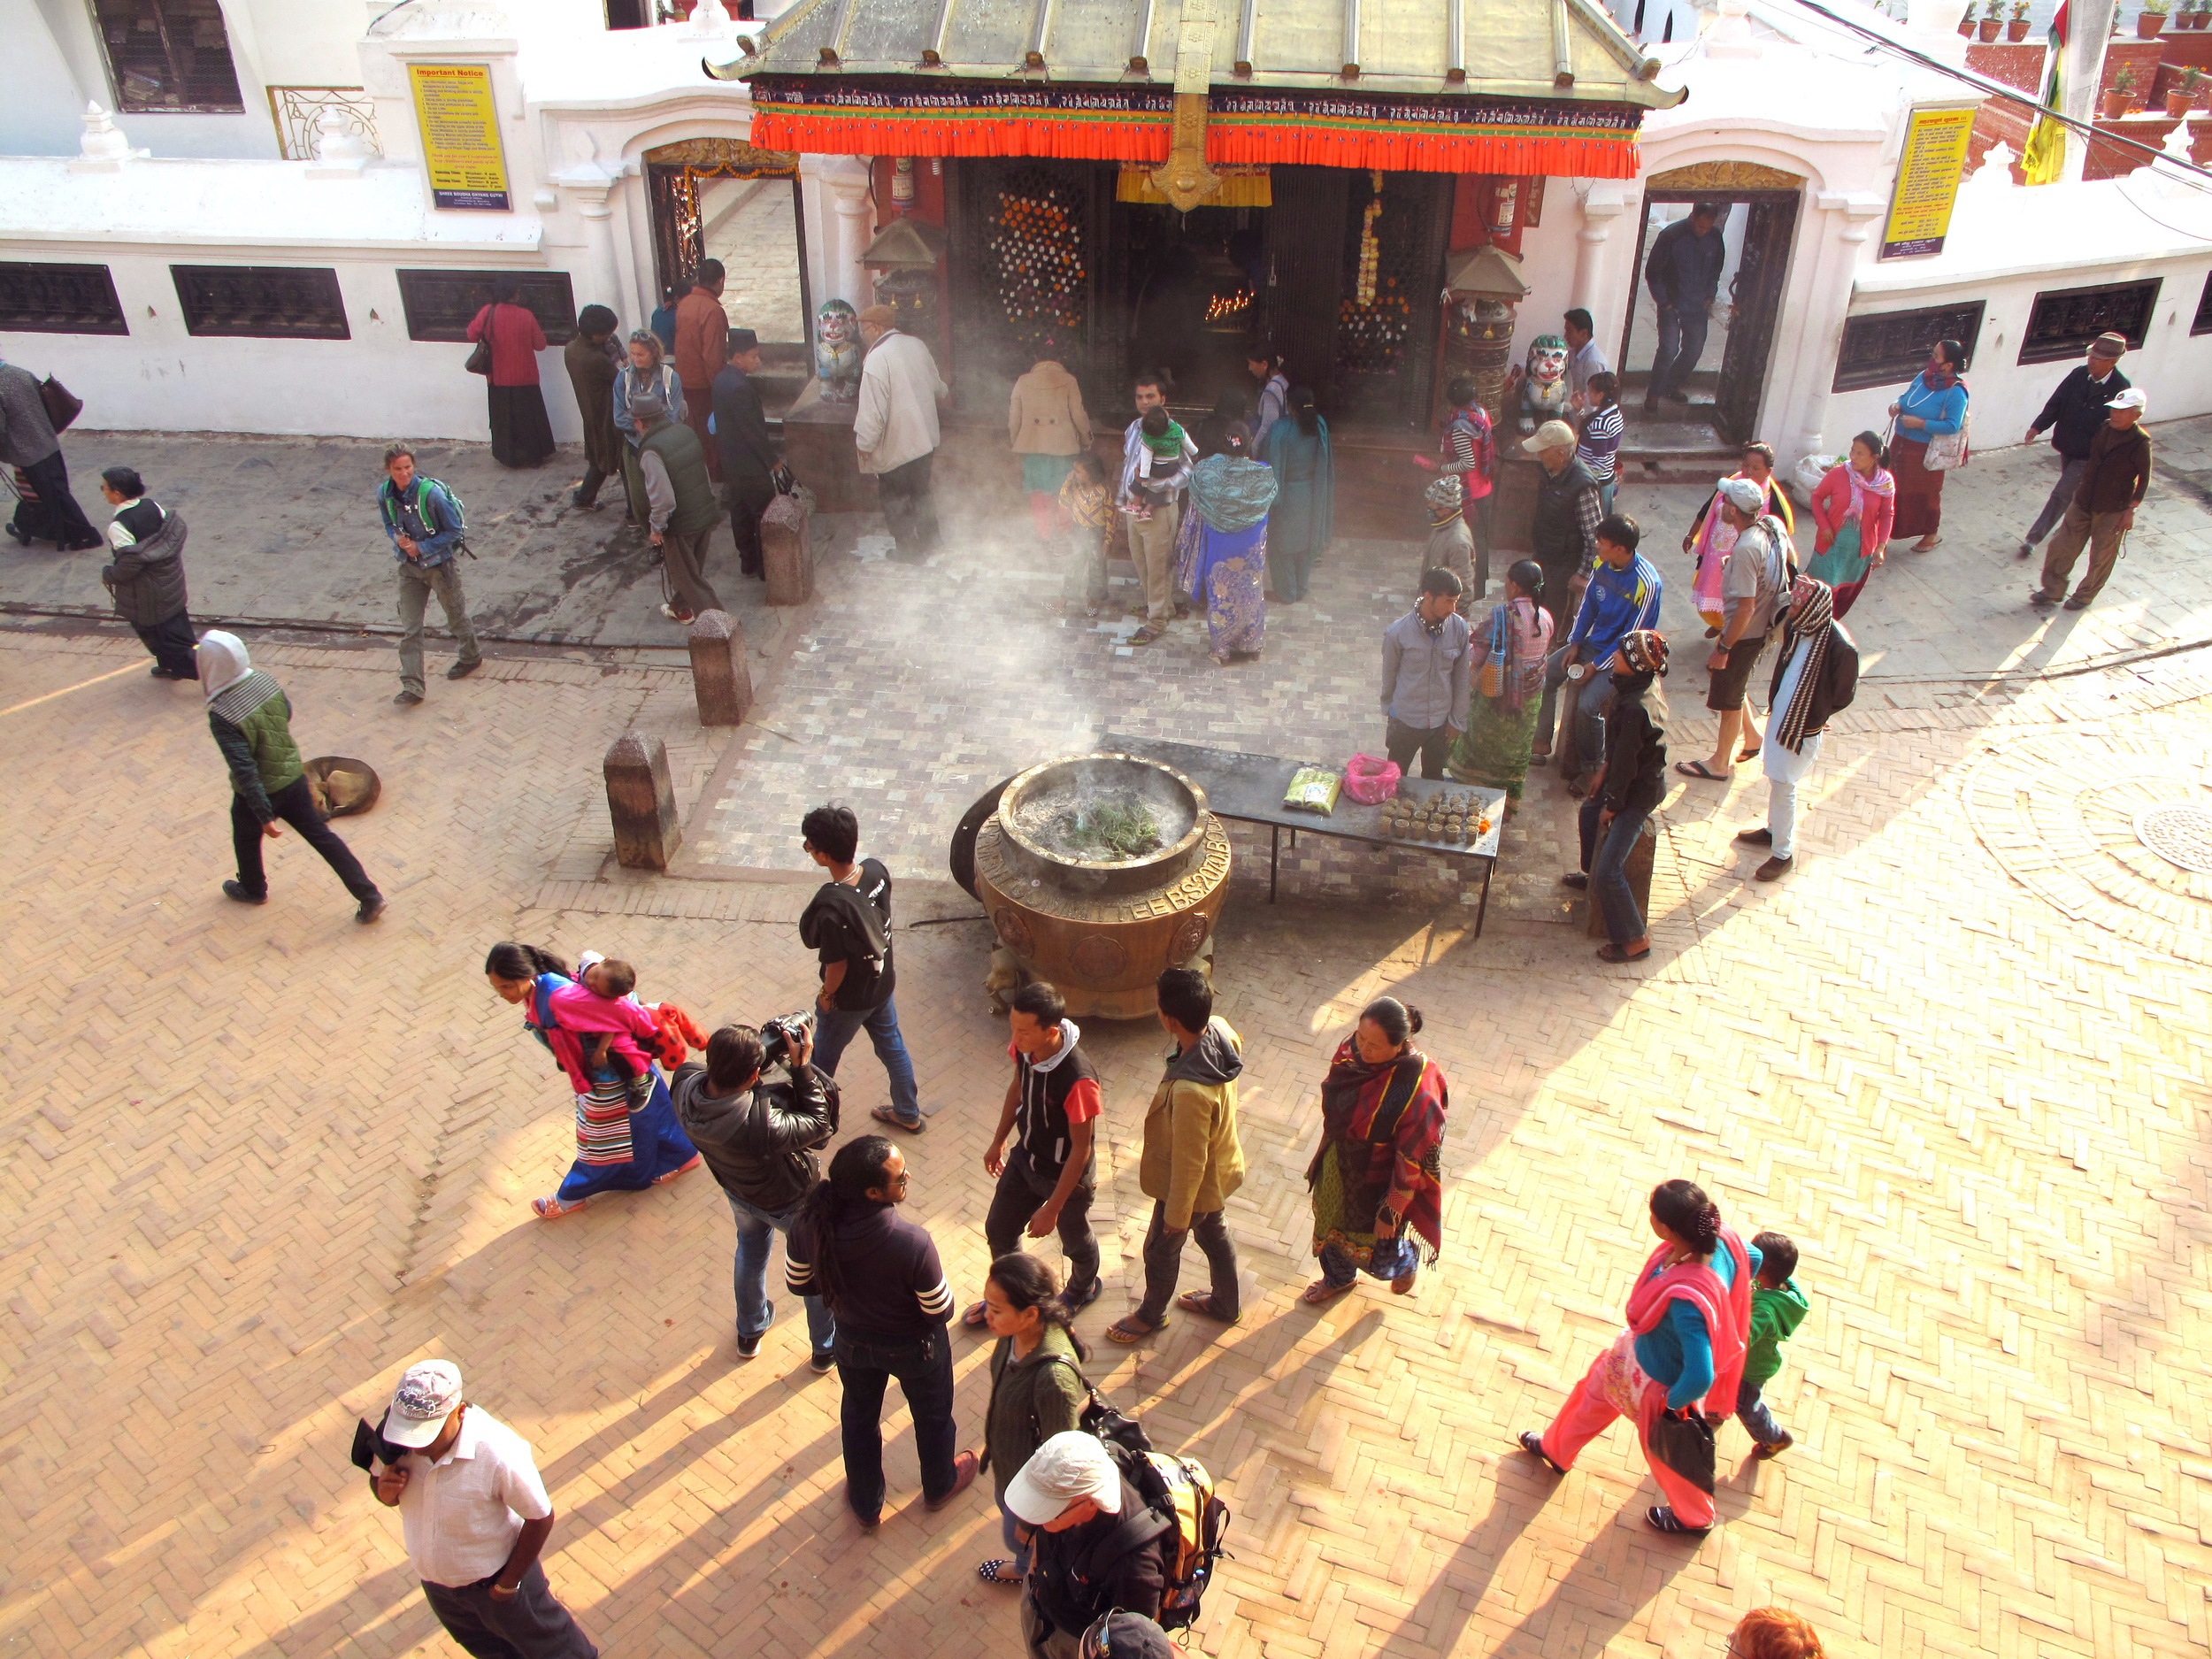 Kat_Bouddhanath stuppa_people below temple.jpg